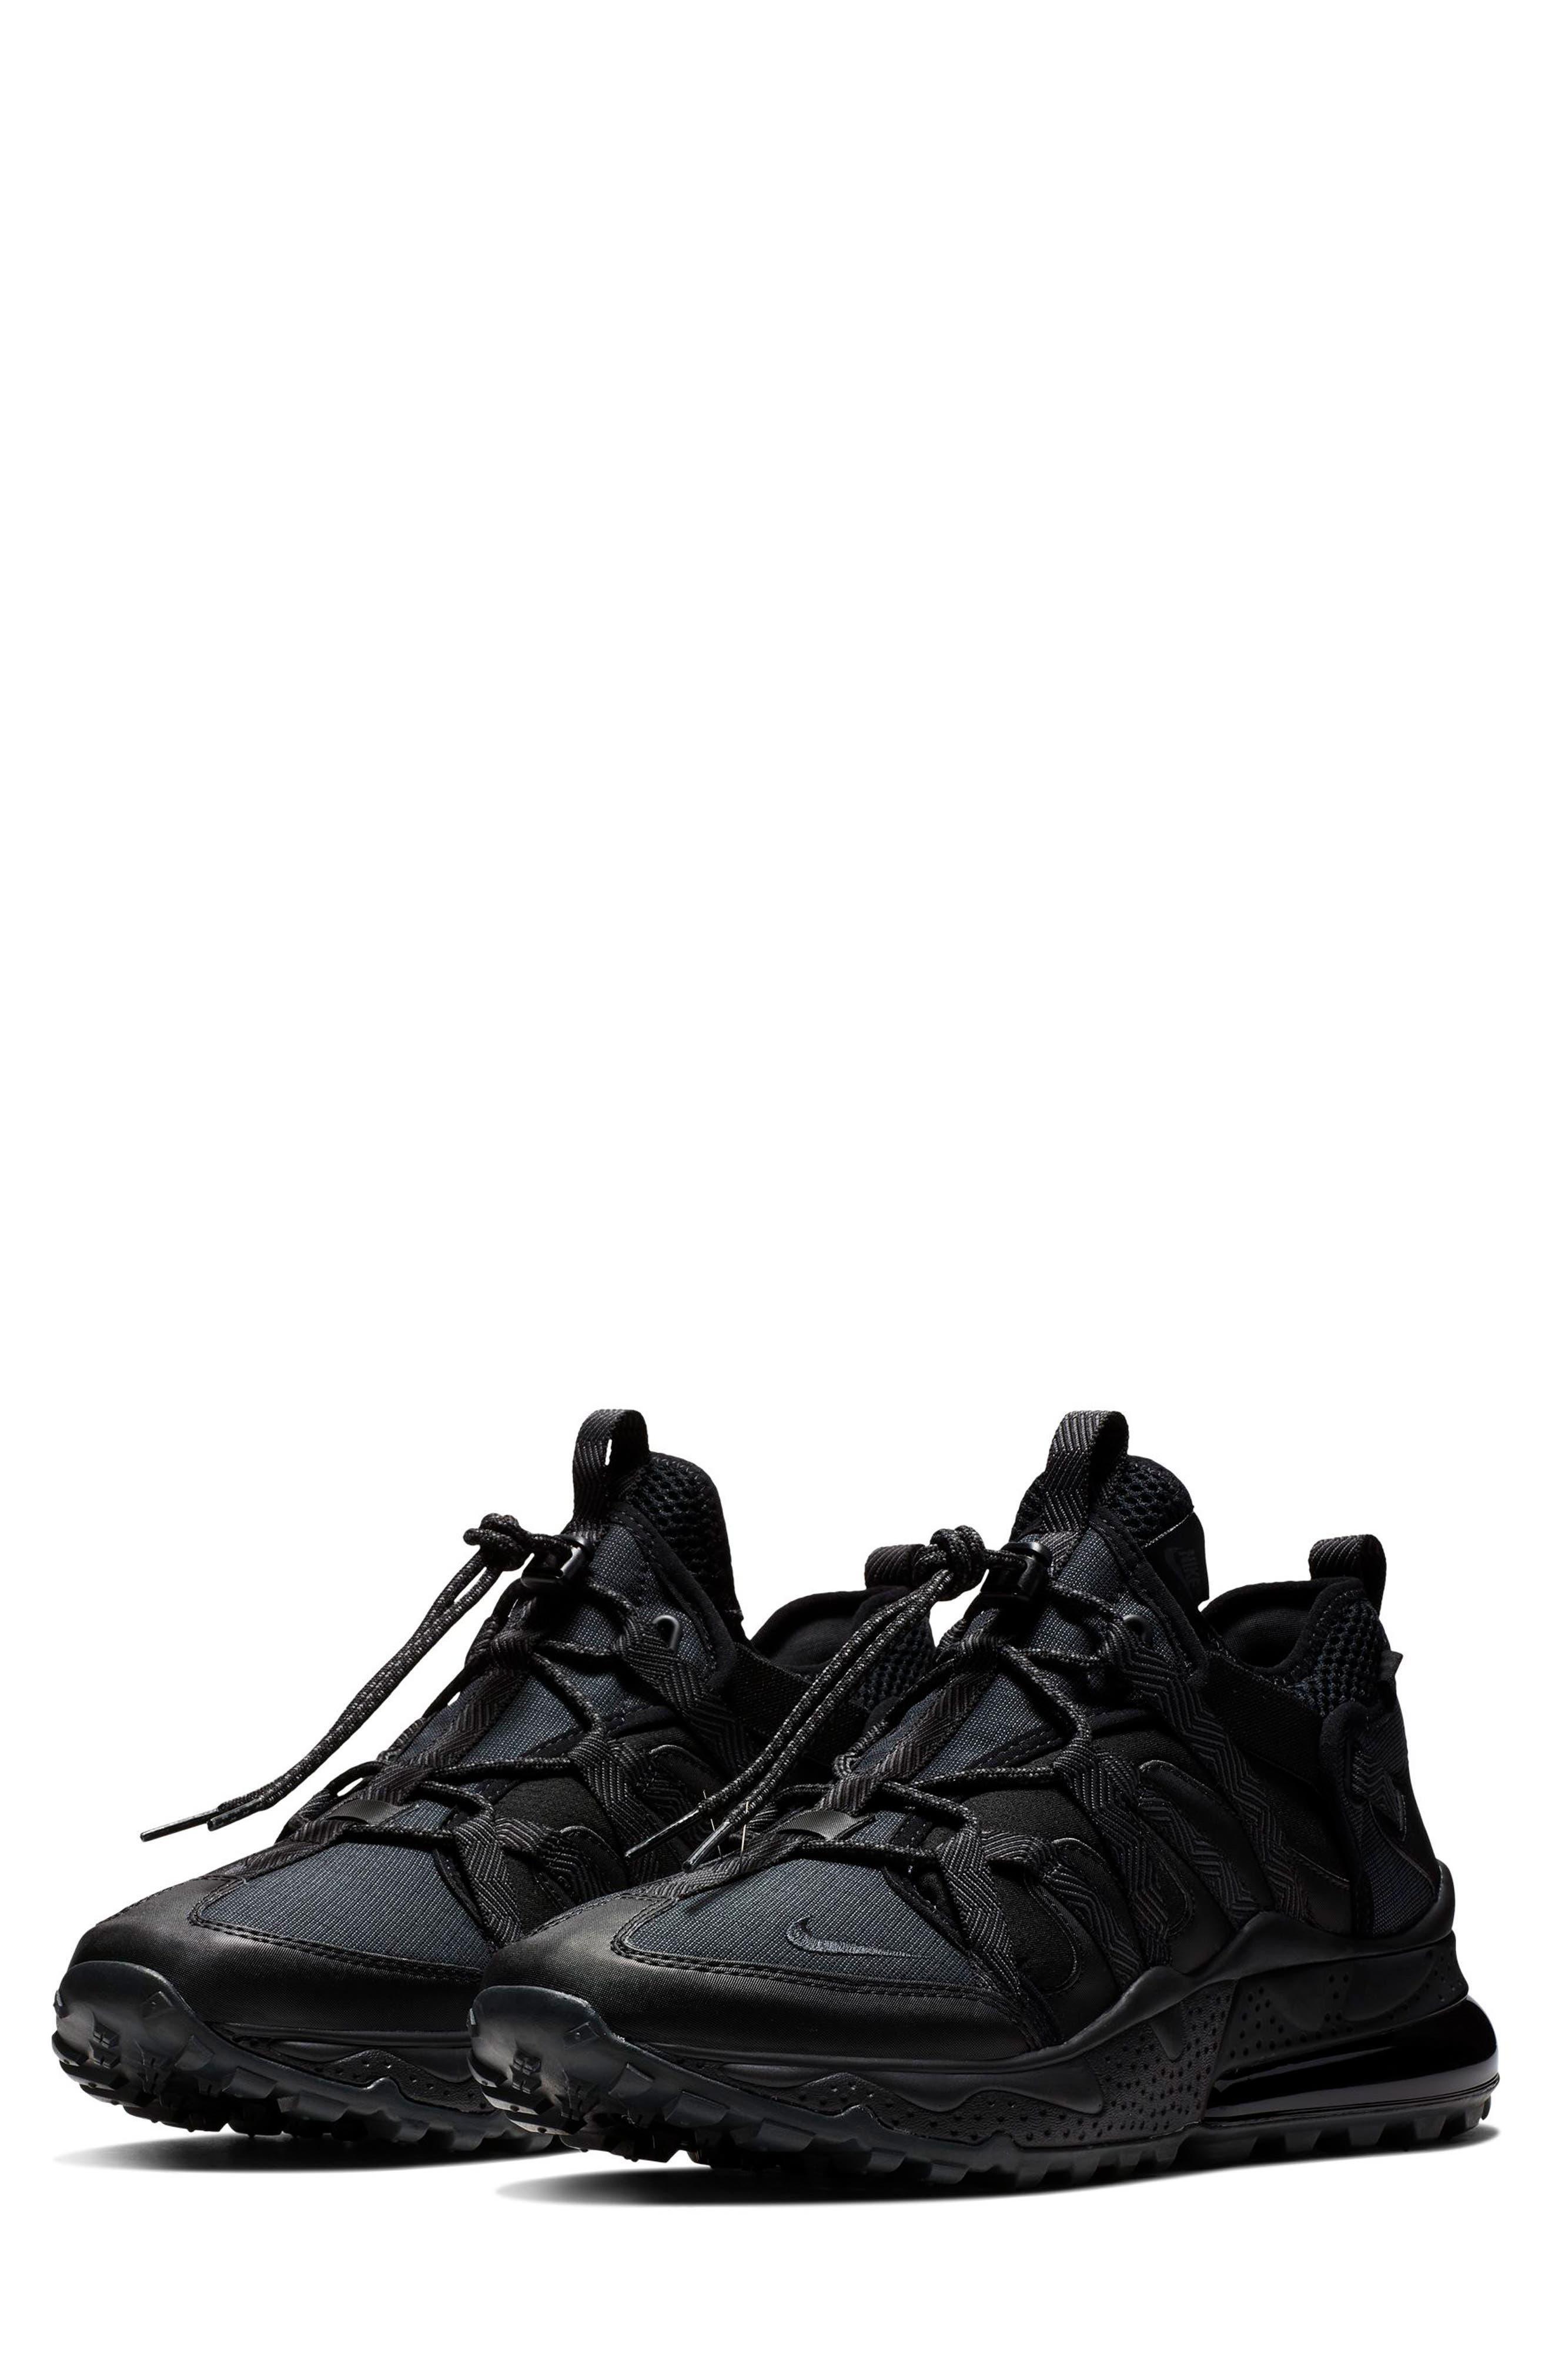 Air Max 270 Bowfin Sneaker,                         Main,                         color, BLACK/ ANTHRACITE/ BLACK